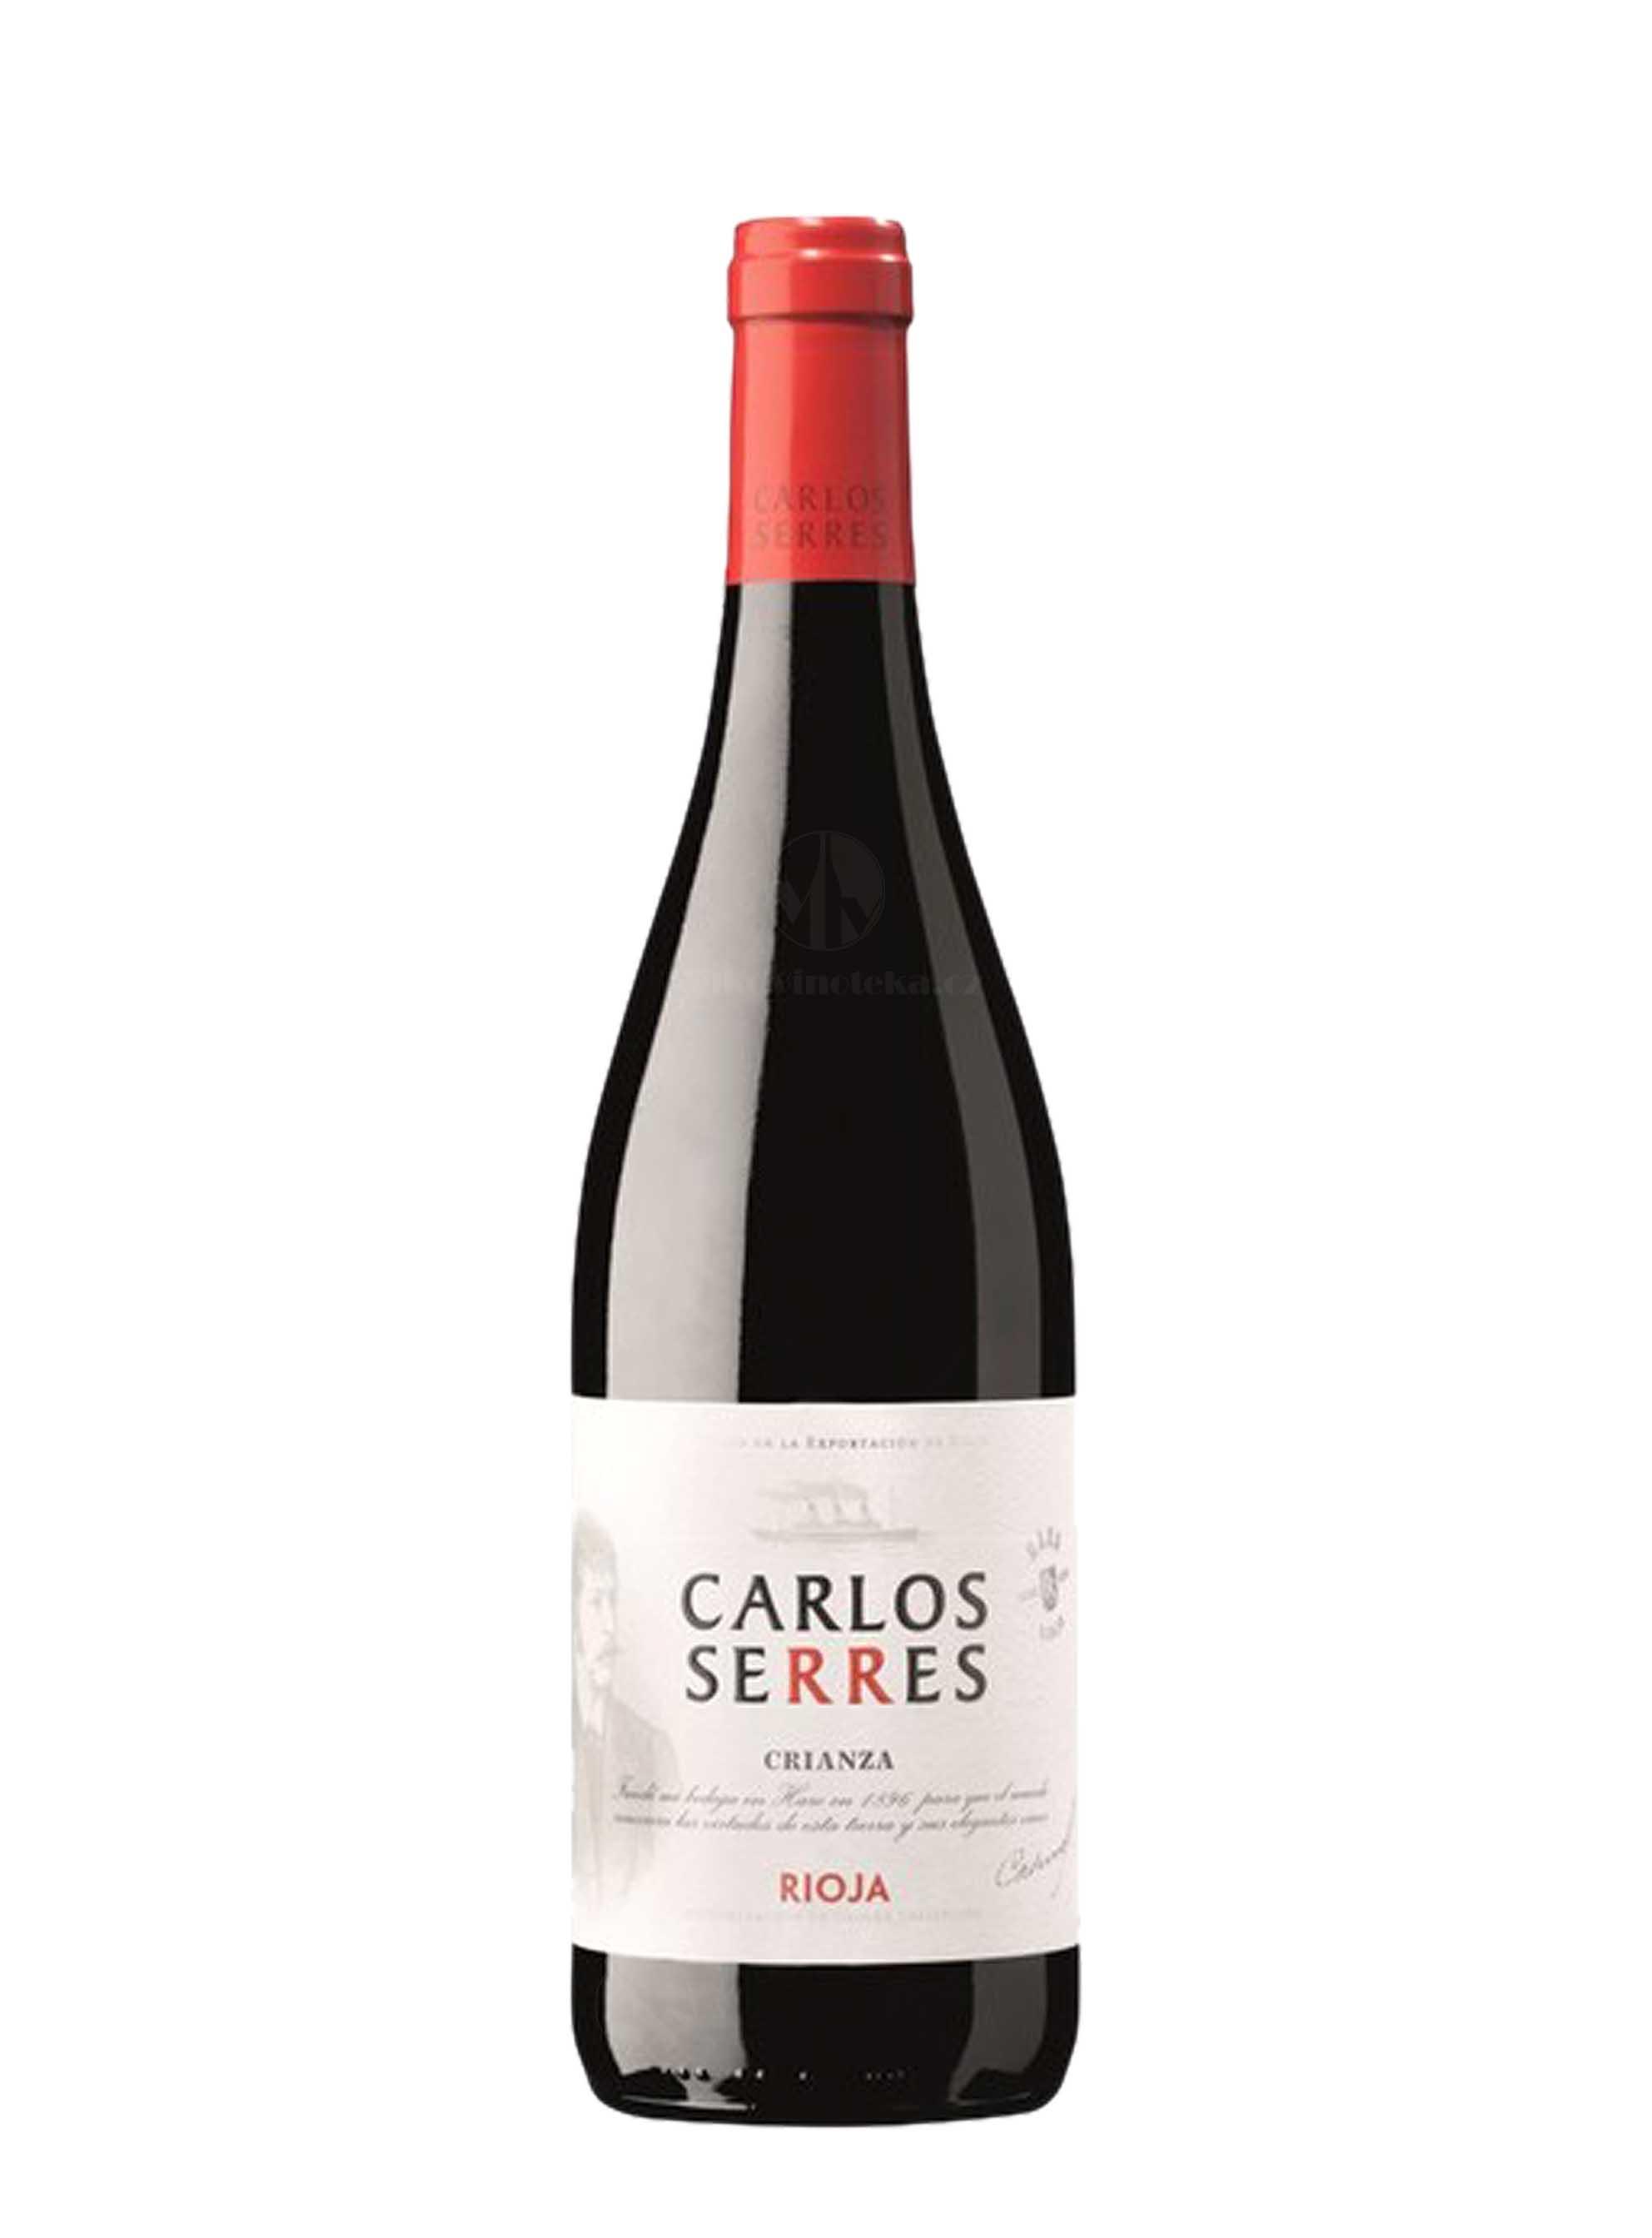 Cuvée, DOCa Crianza, 2014, Carlos Serres, 0.75 l